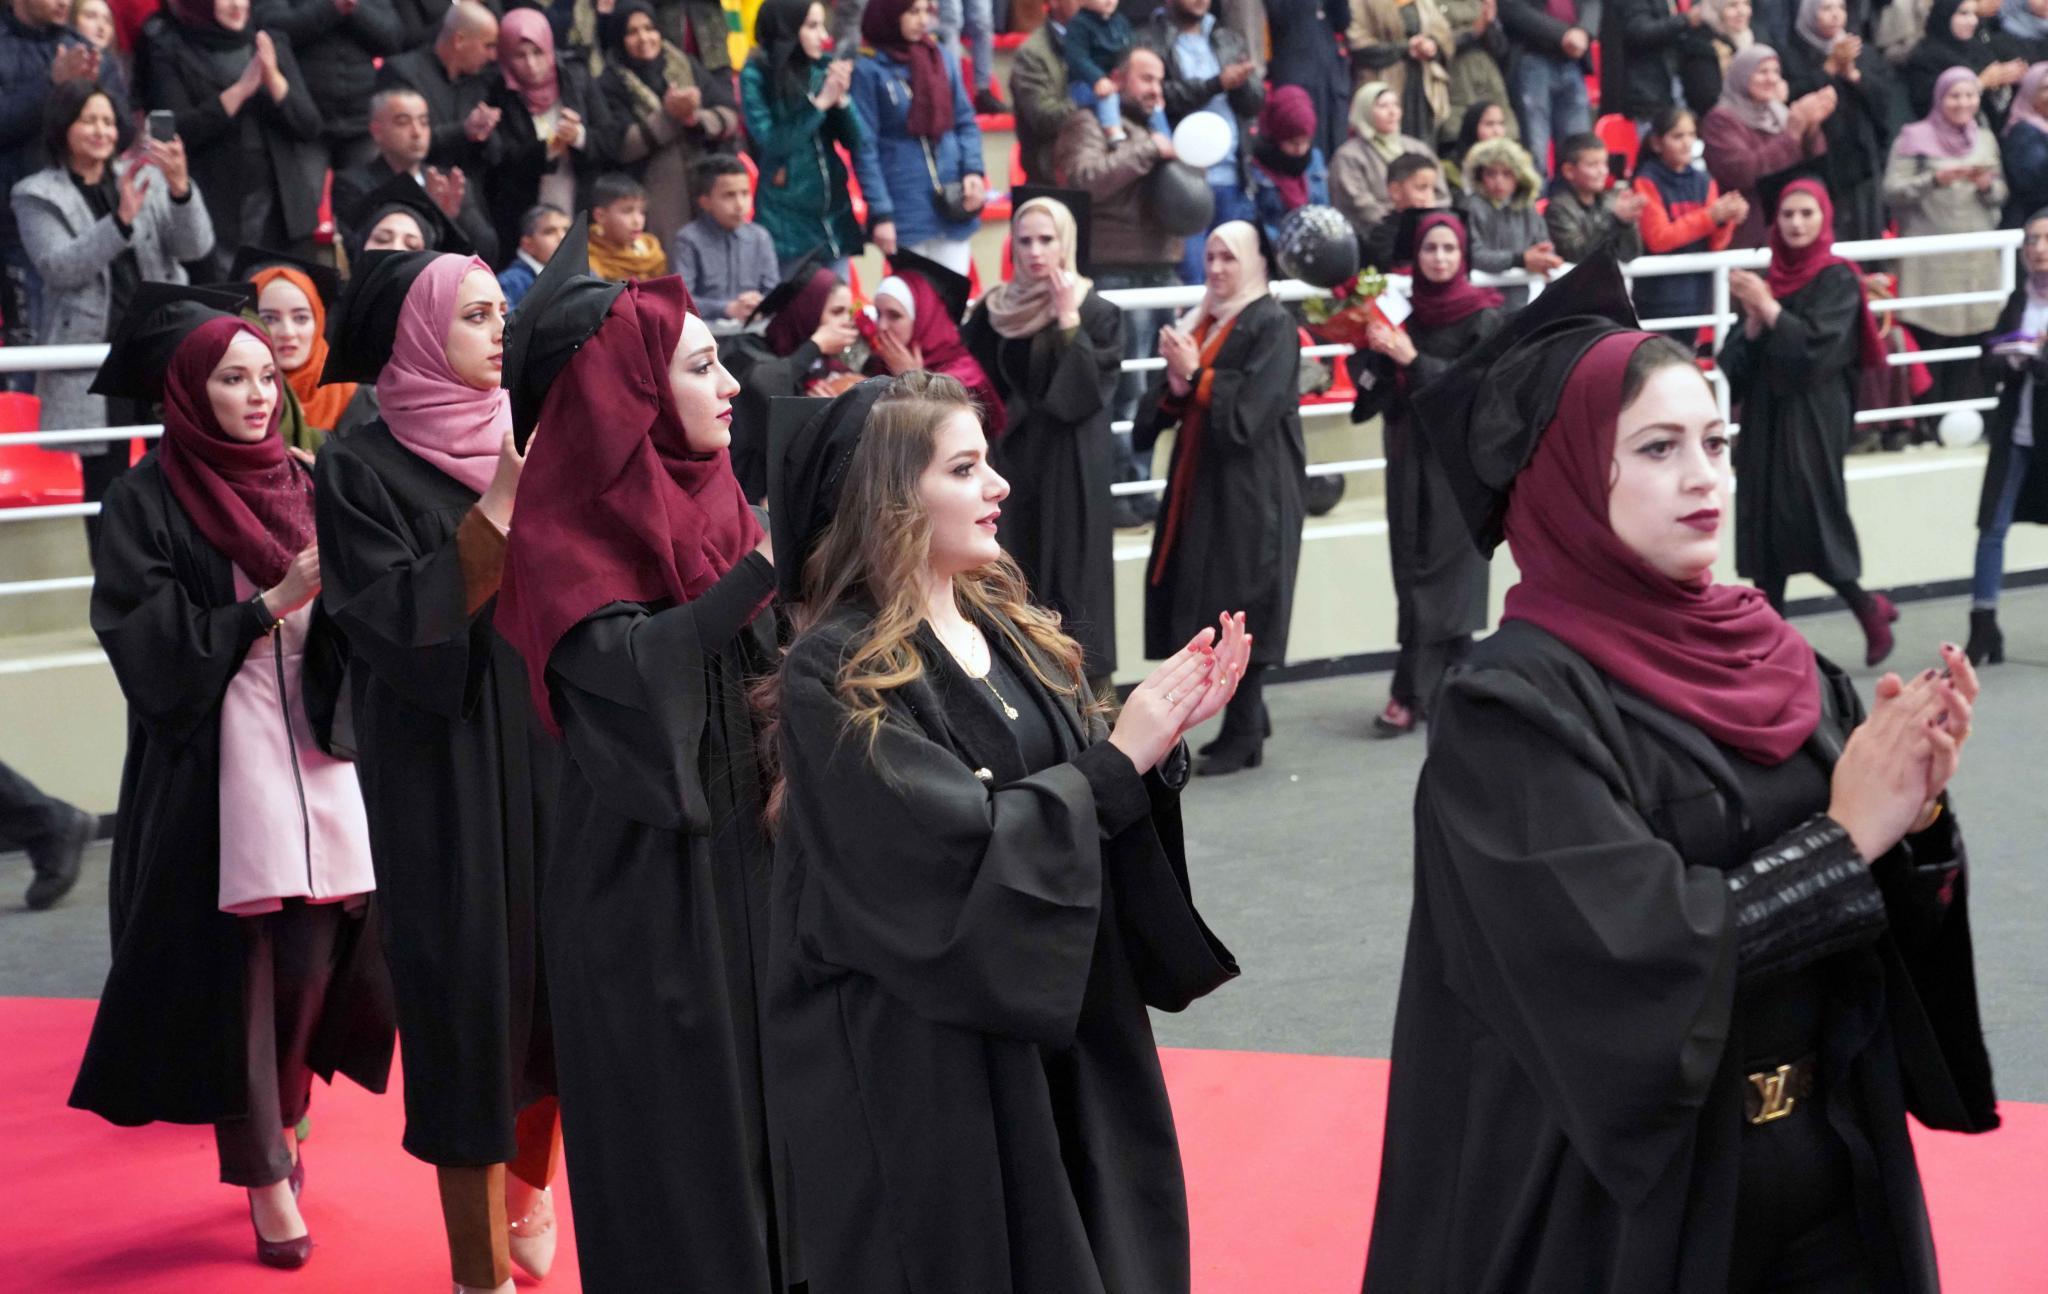 Part of the Graduation